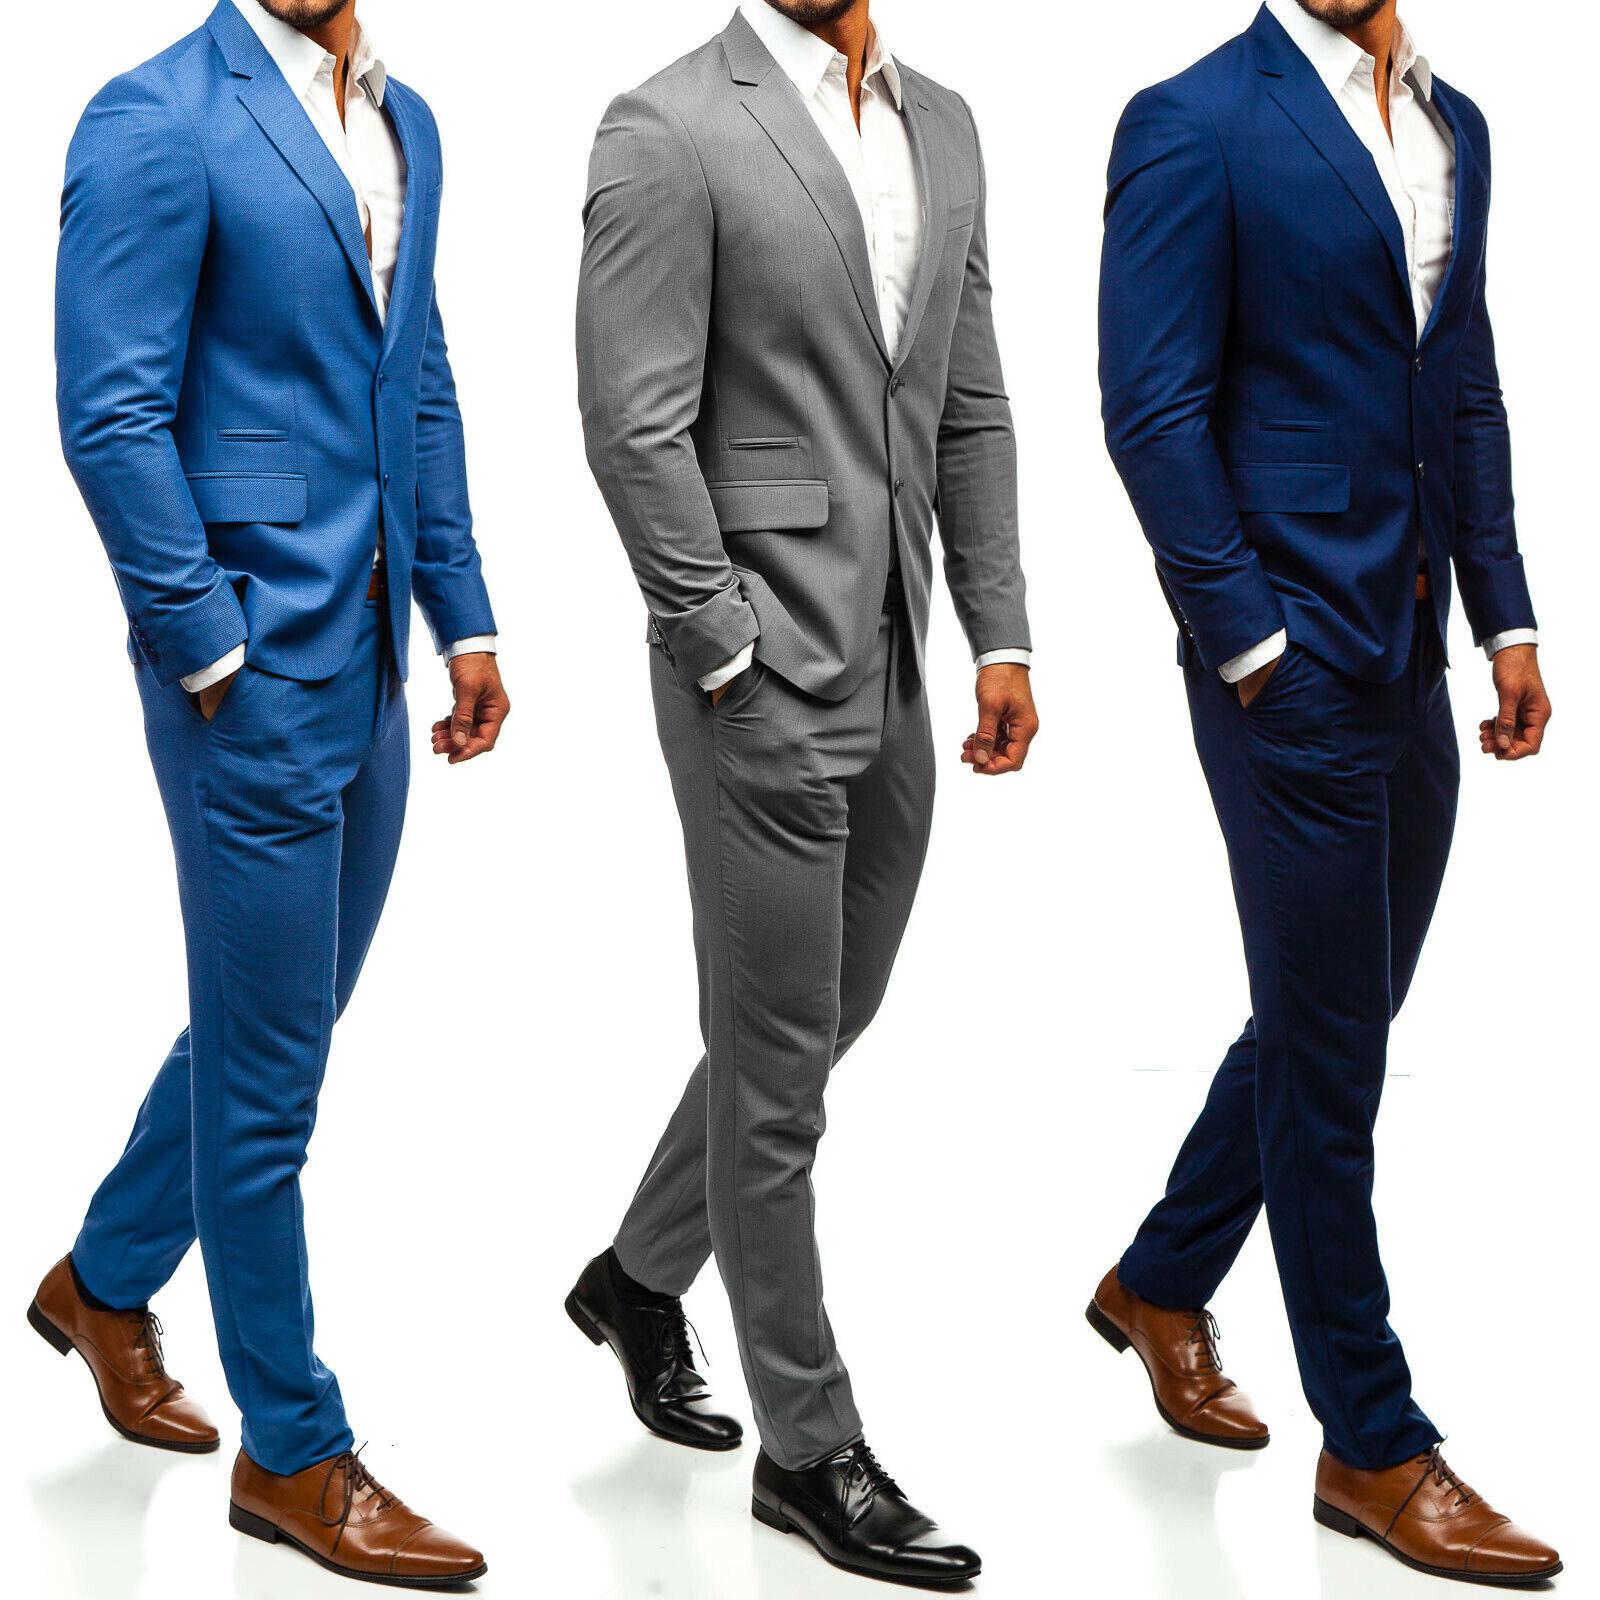 Anzug Sakko Jacke Blazer Klassisch Slim Fit Casual Herren Mix BOLF 1J2 Classic